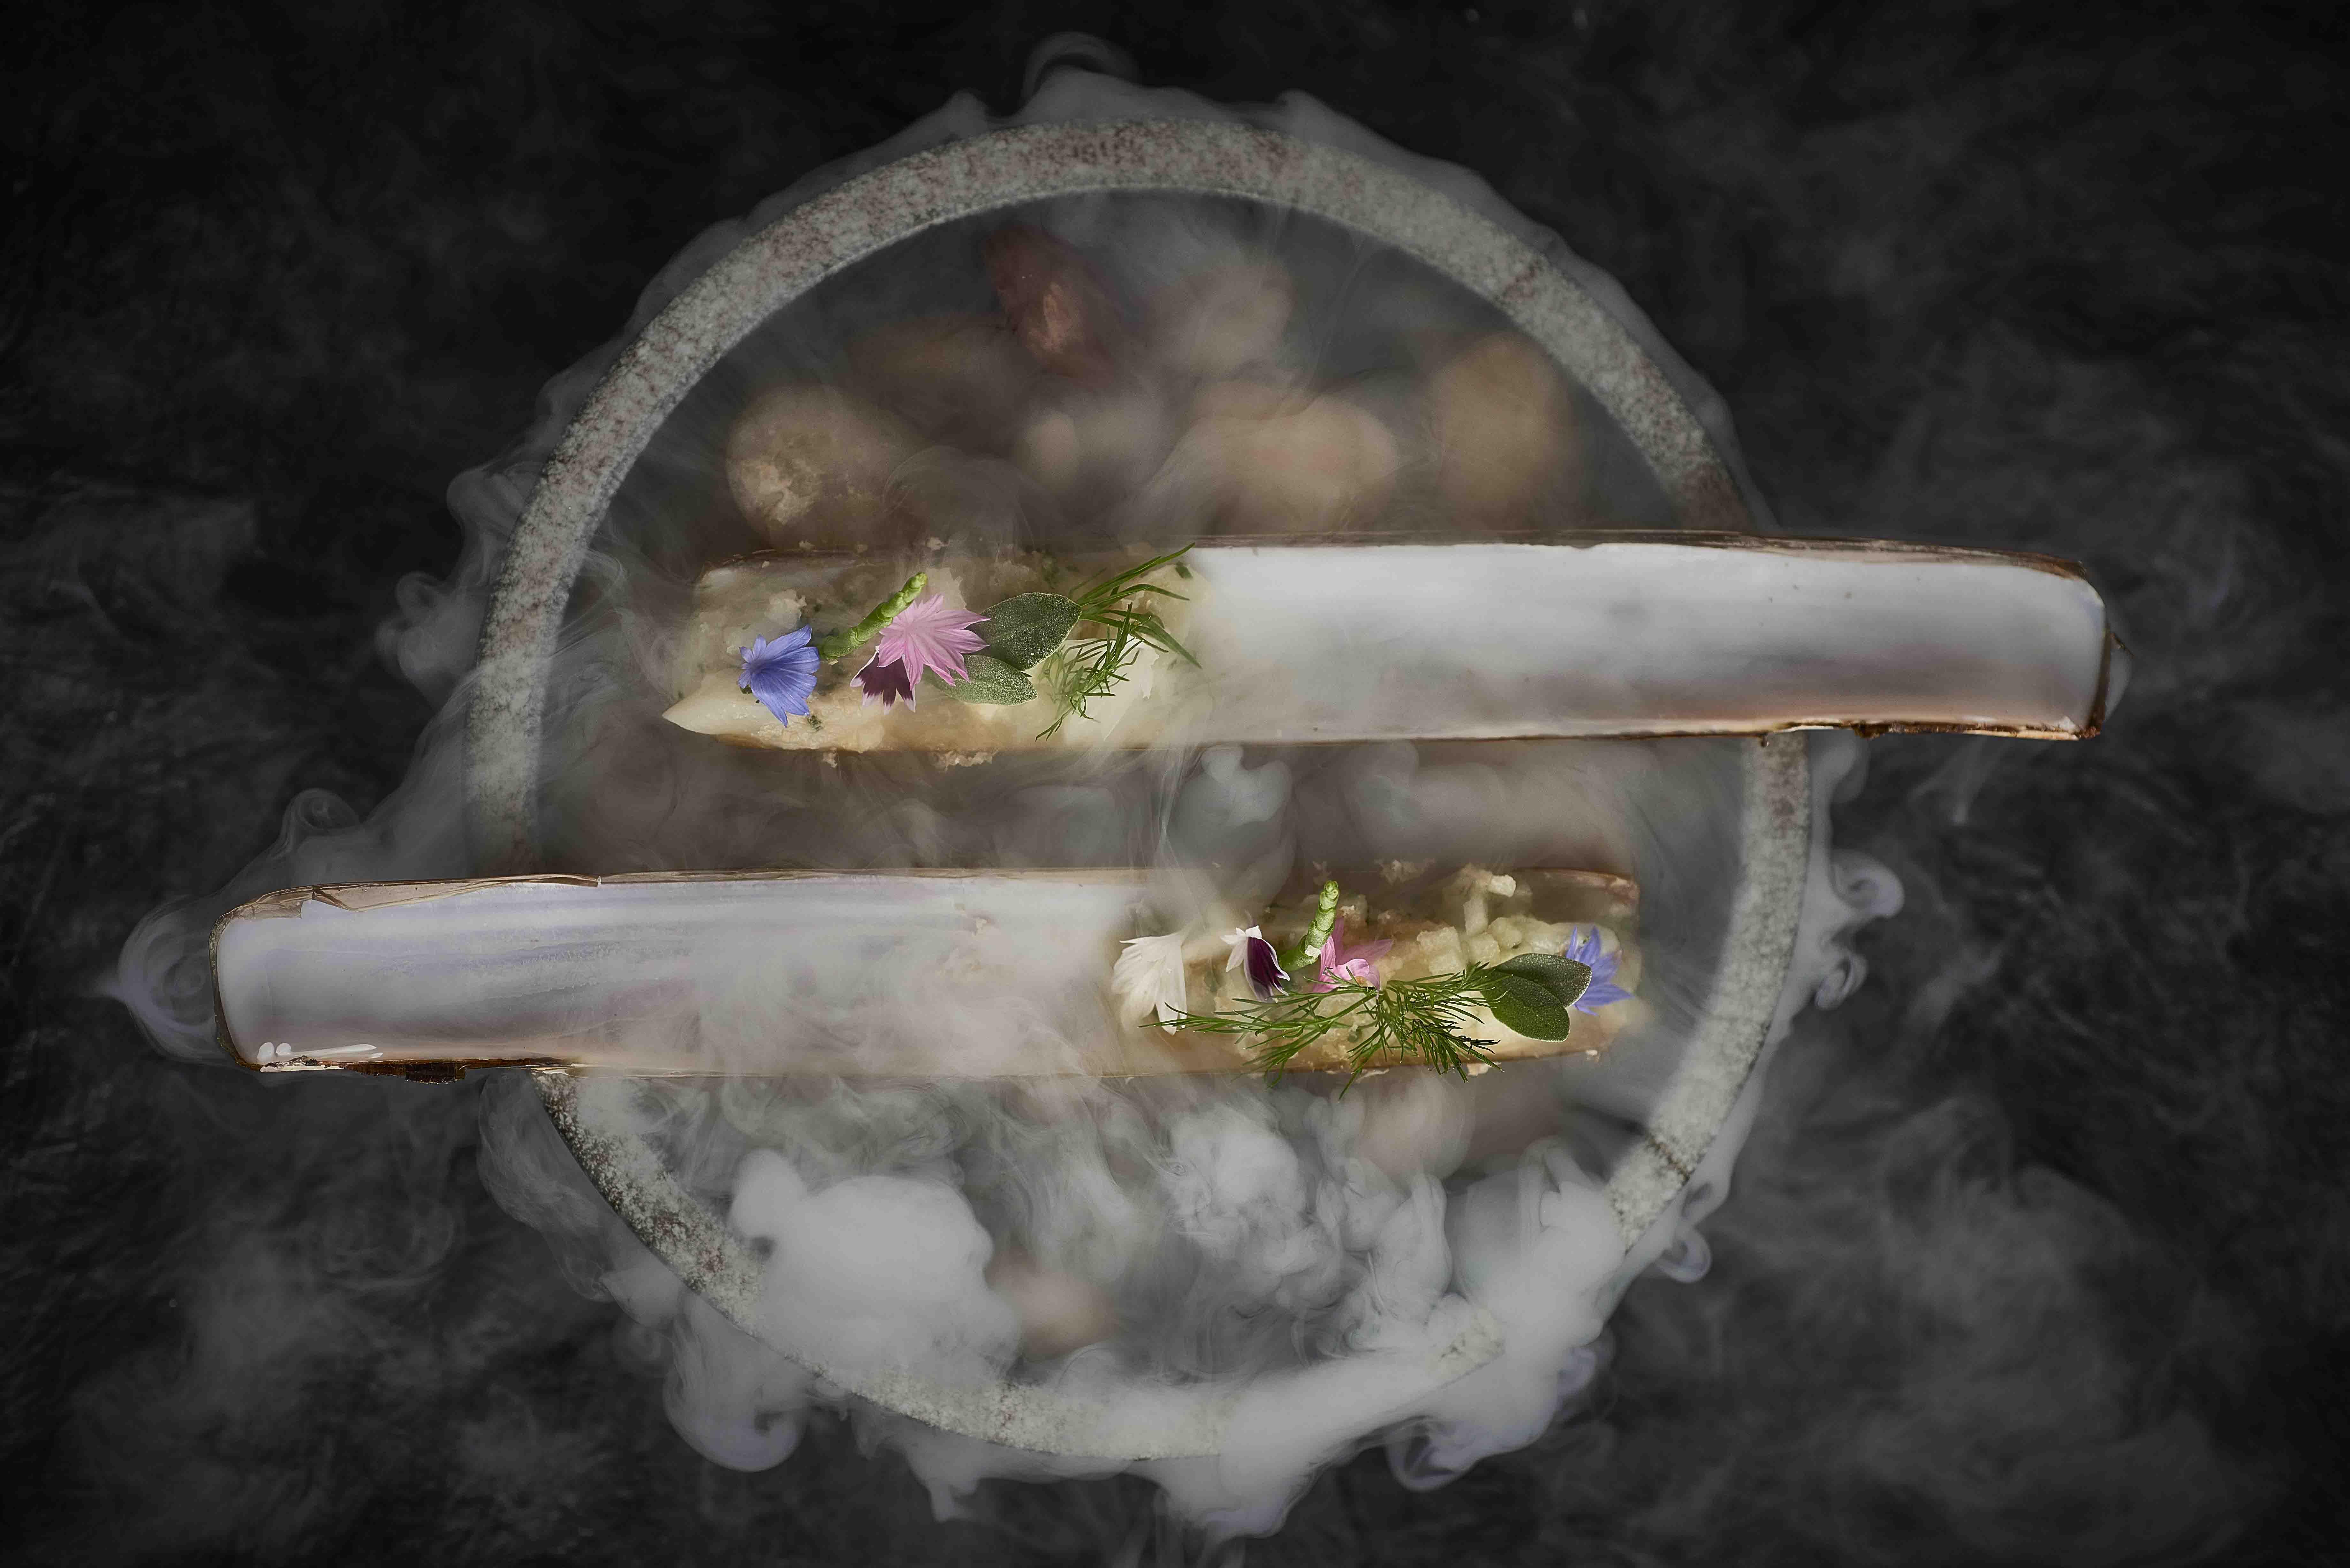 Frog by Adam Handling, Covent Garden, London: Restaurant Review